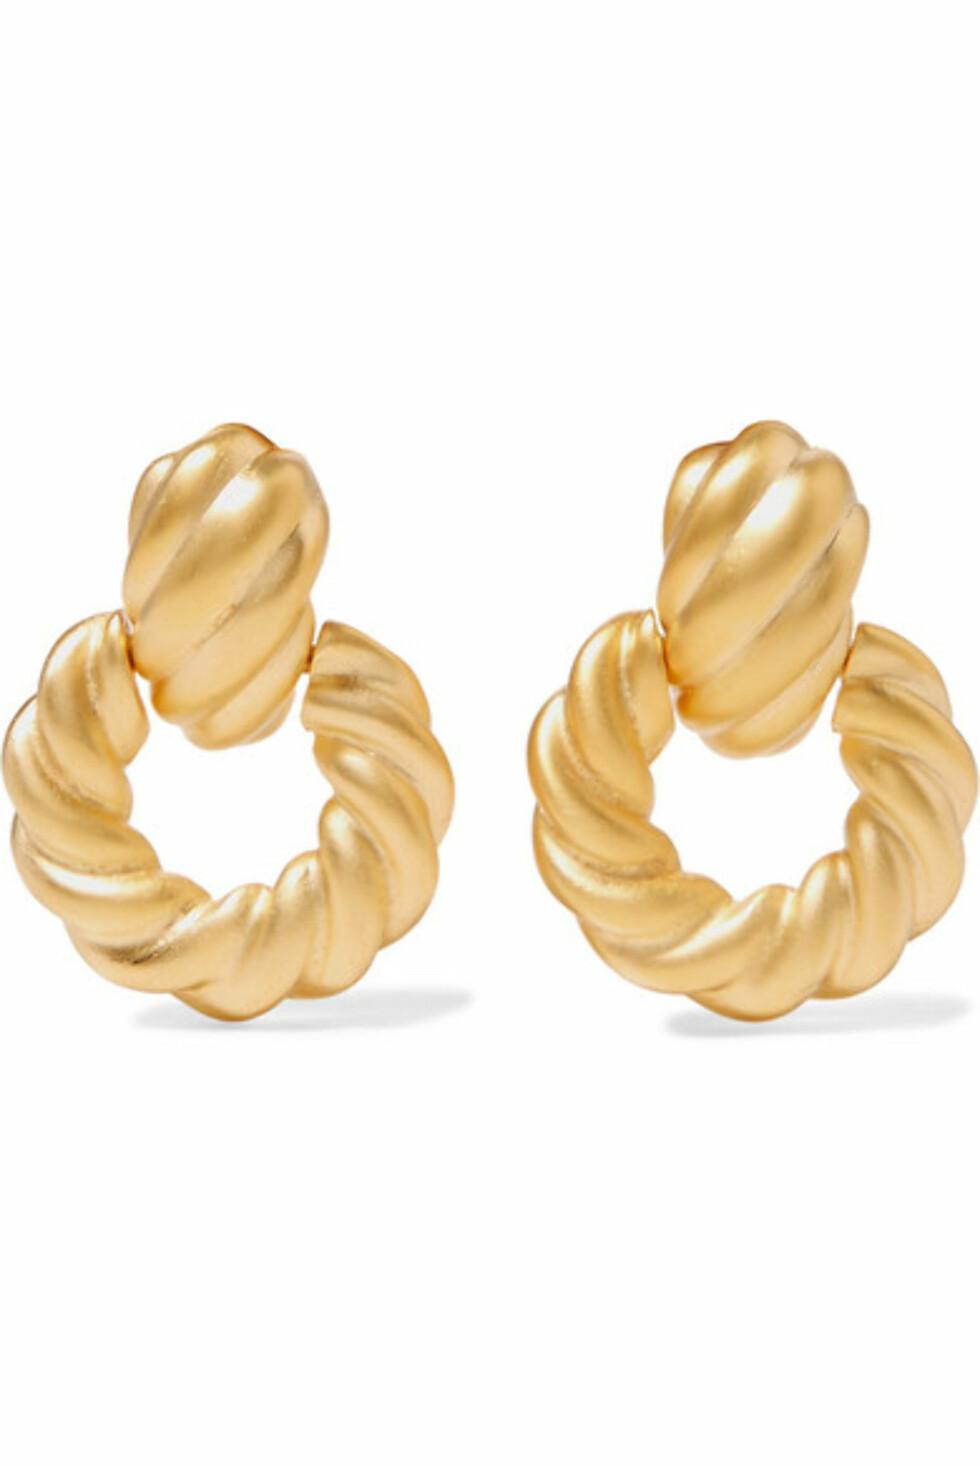 Øredobber fra Kenneth Jay Lane |437,-| https://www.net-a-porter.com/no/en/product/1064399/kenneth_jay_lane/gold-tone-clip-earrings